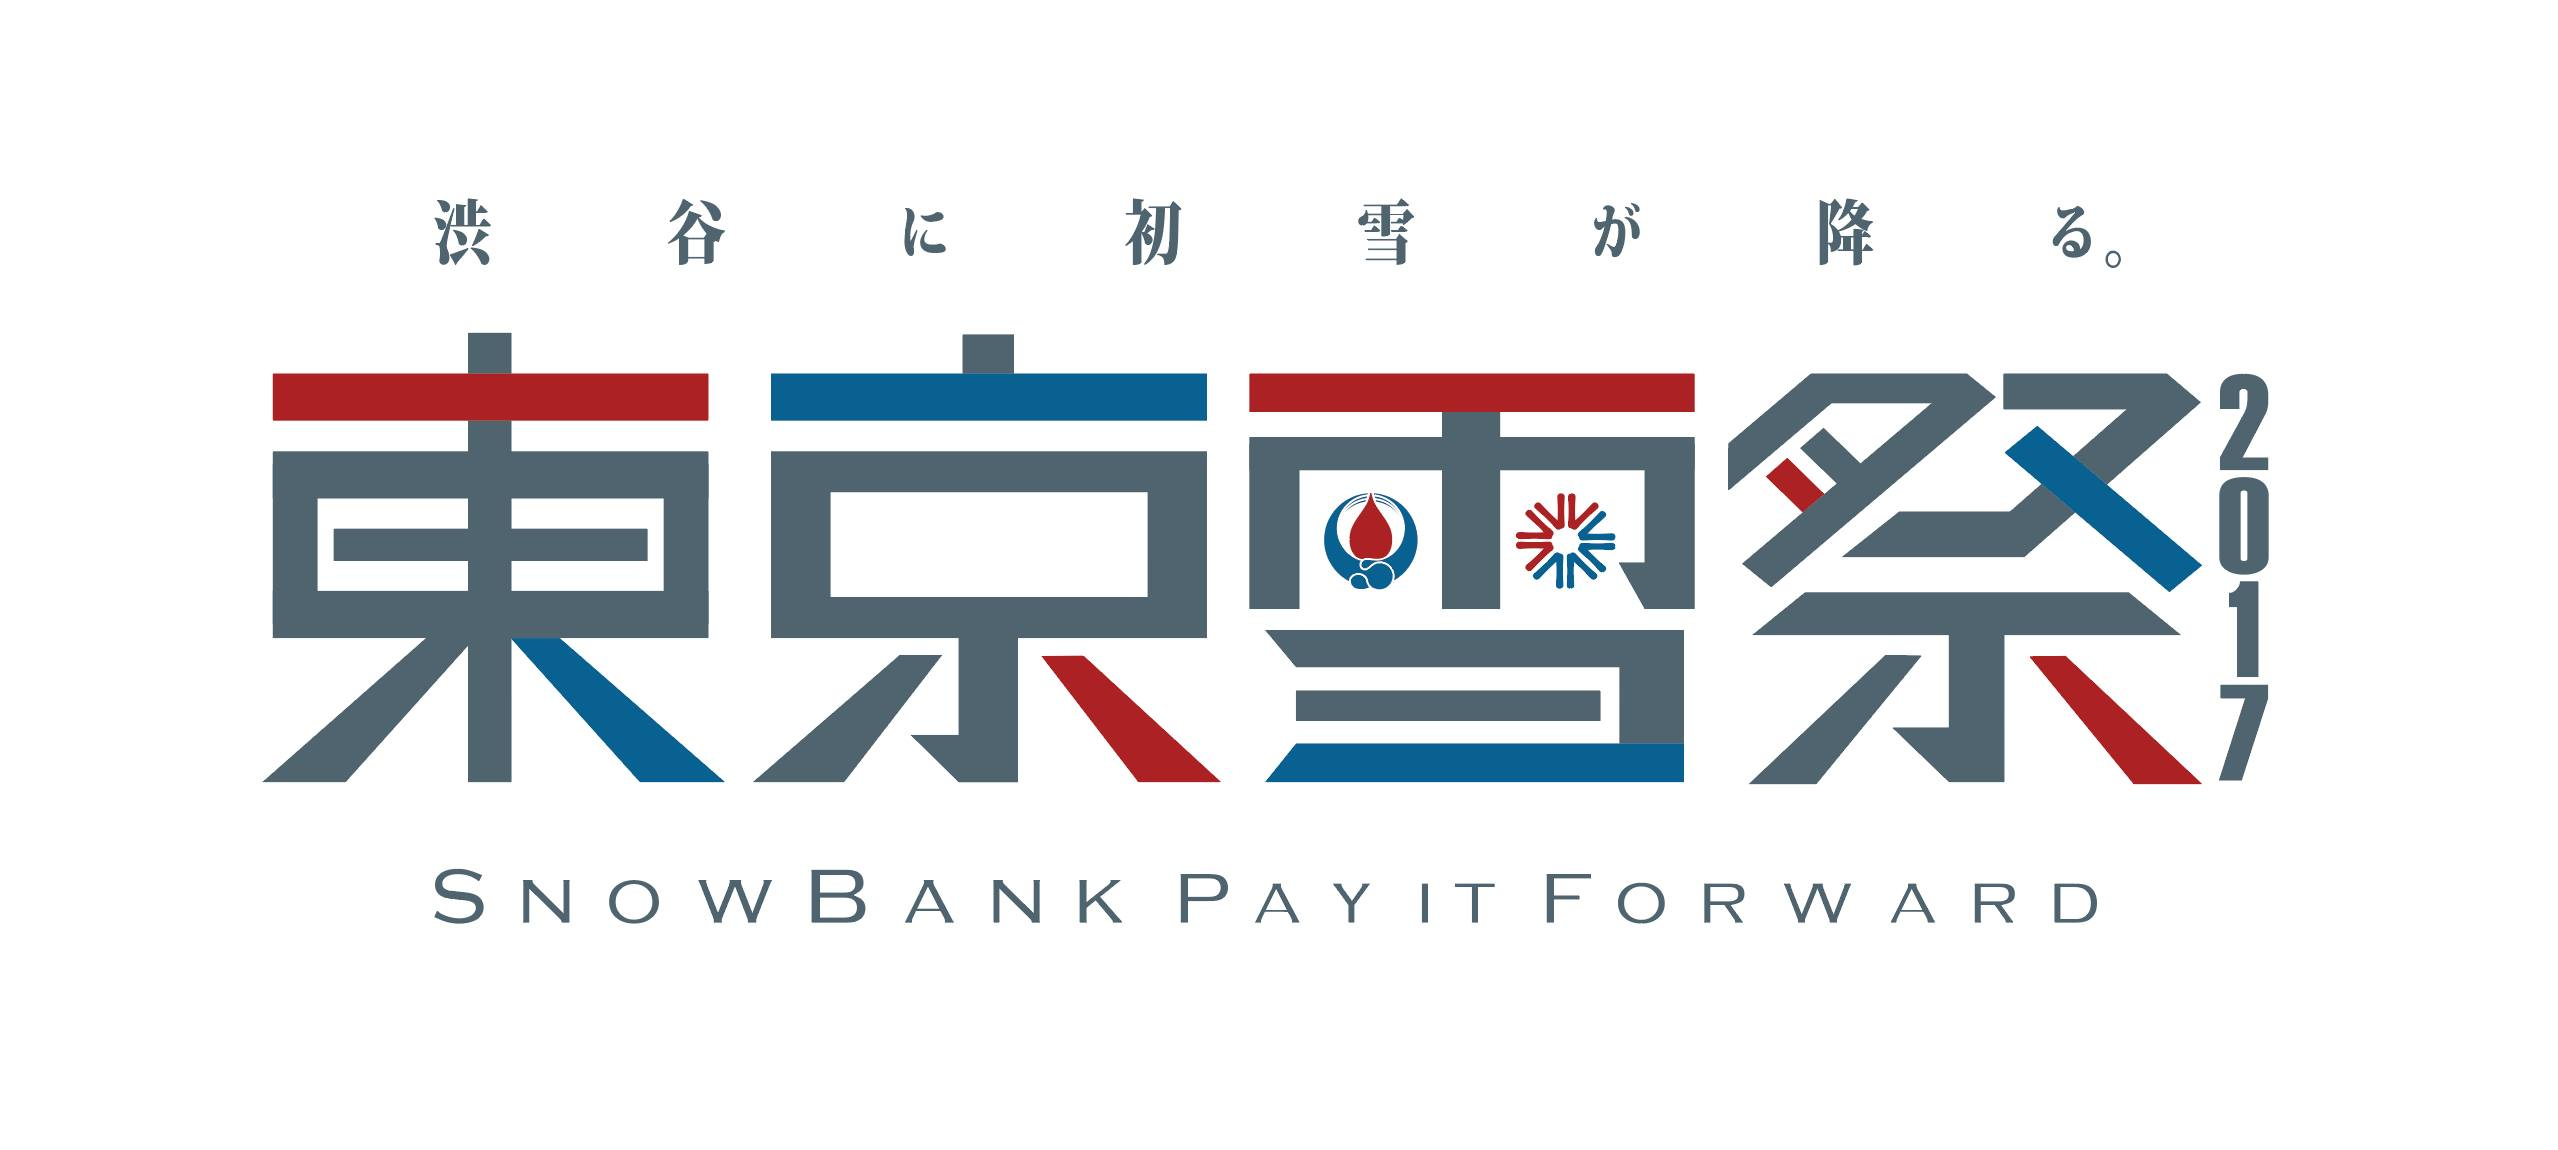 Snow Bank Pay It Forward